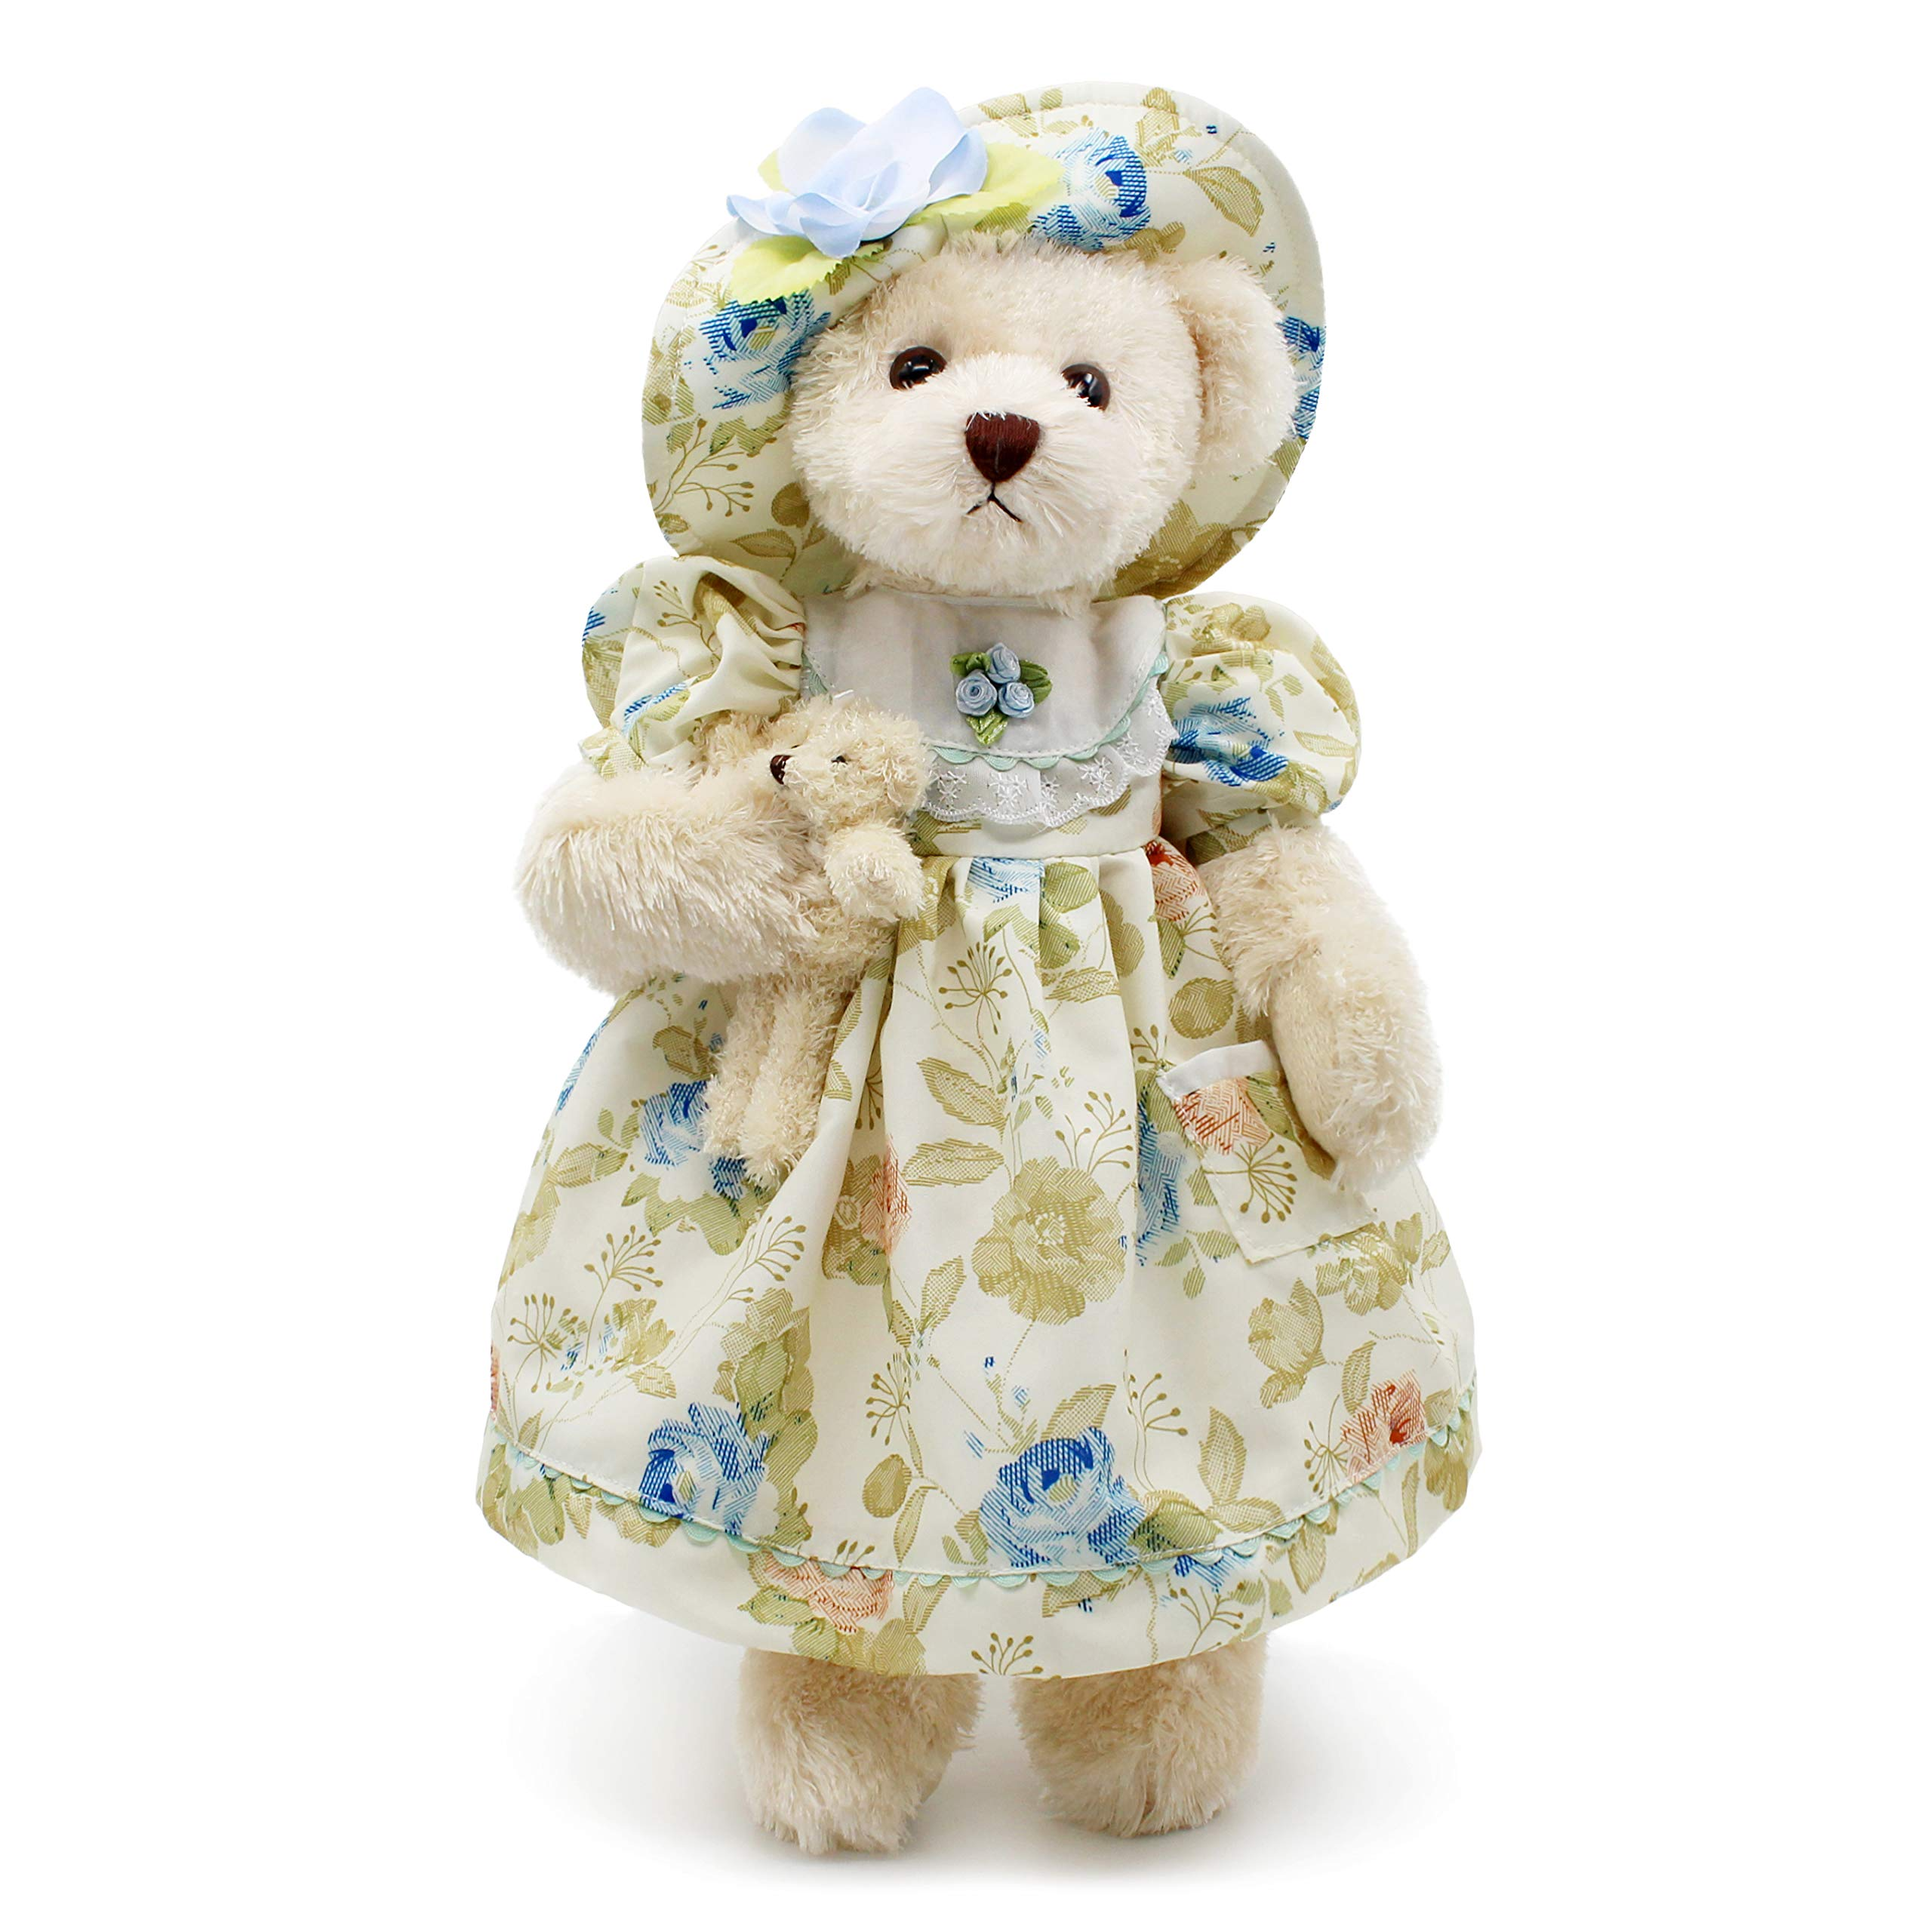 Oitscute Teddy Bears Baby Cute Soft Plush Stuffed Animal Toy for Girl Women 16'' (White Bear Wearing Green Floral Dress) by oits cute